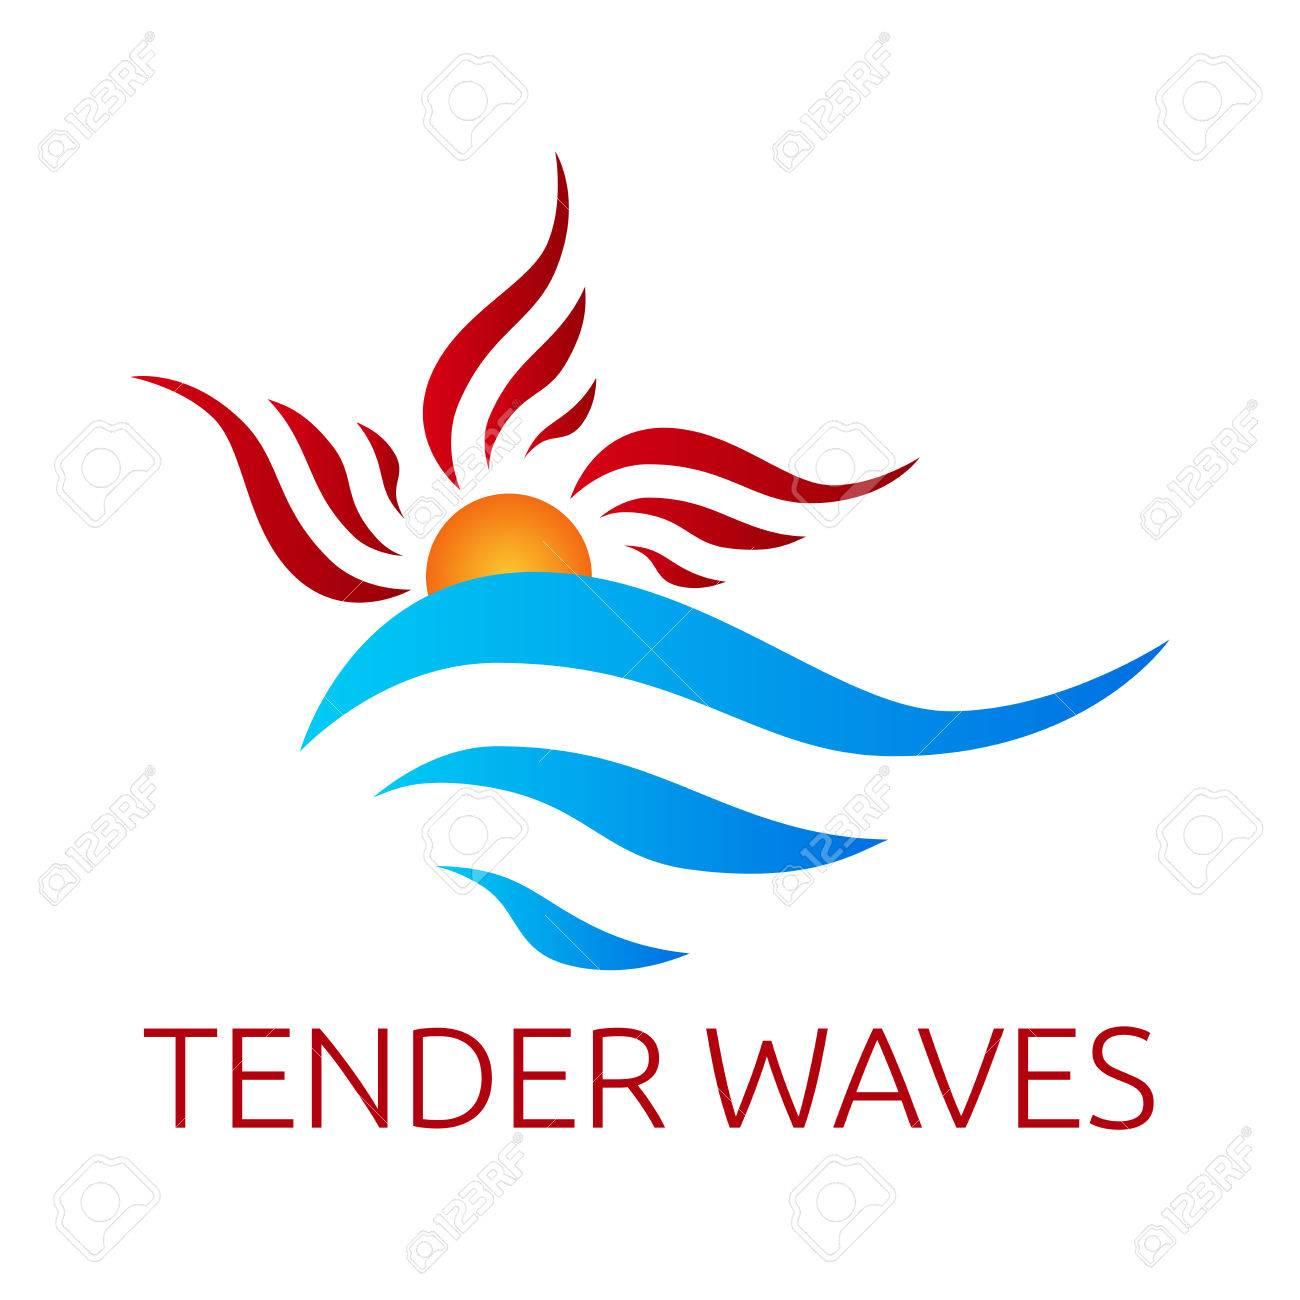 abstract sun and waves logo template eps 10 vector illustration rh 123rf com wave logo black waves login